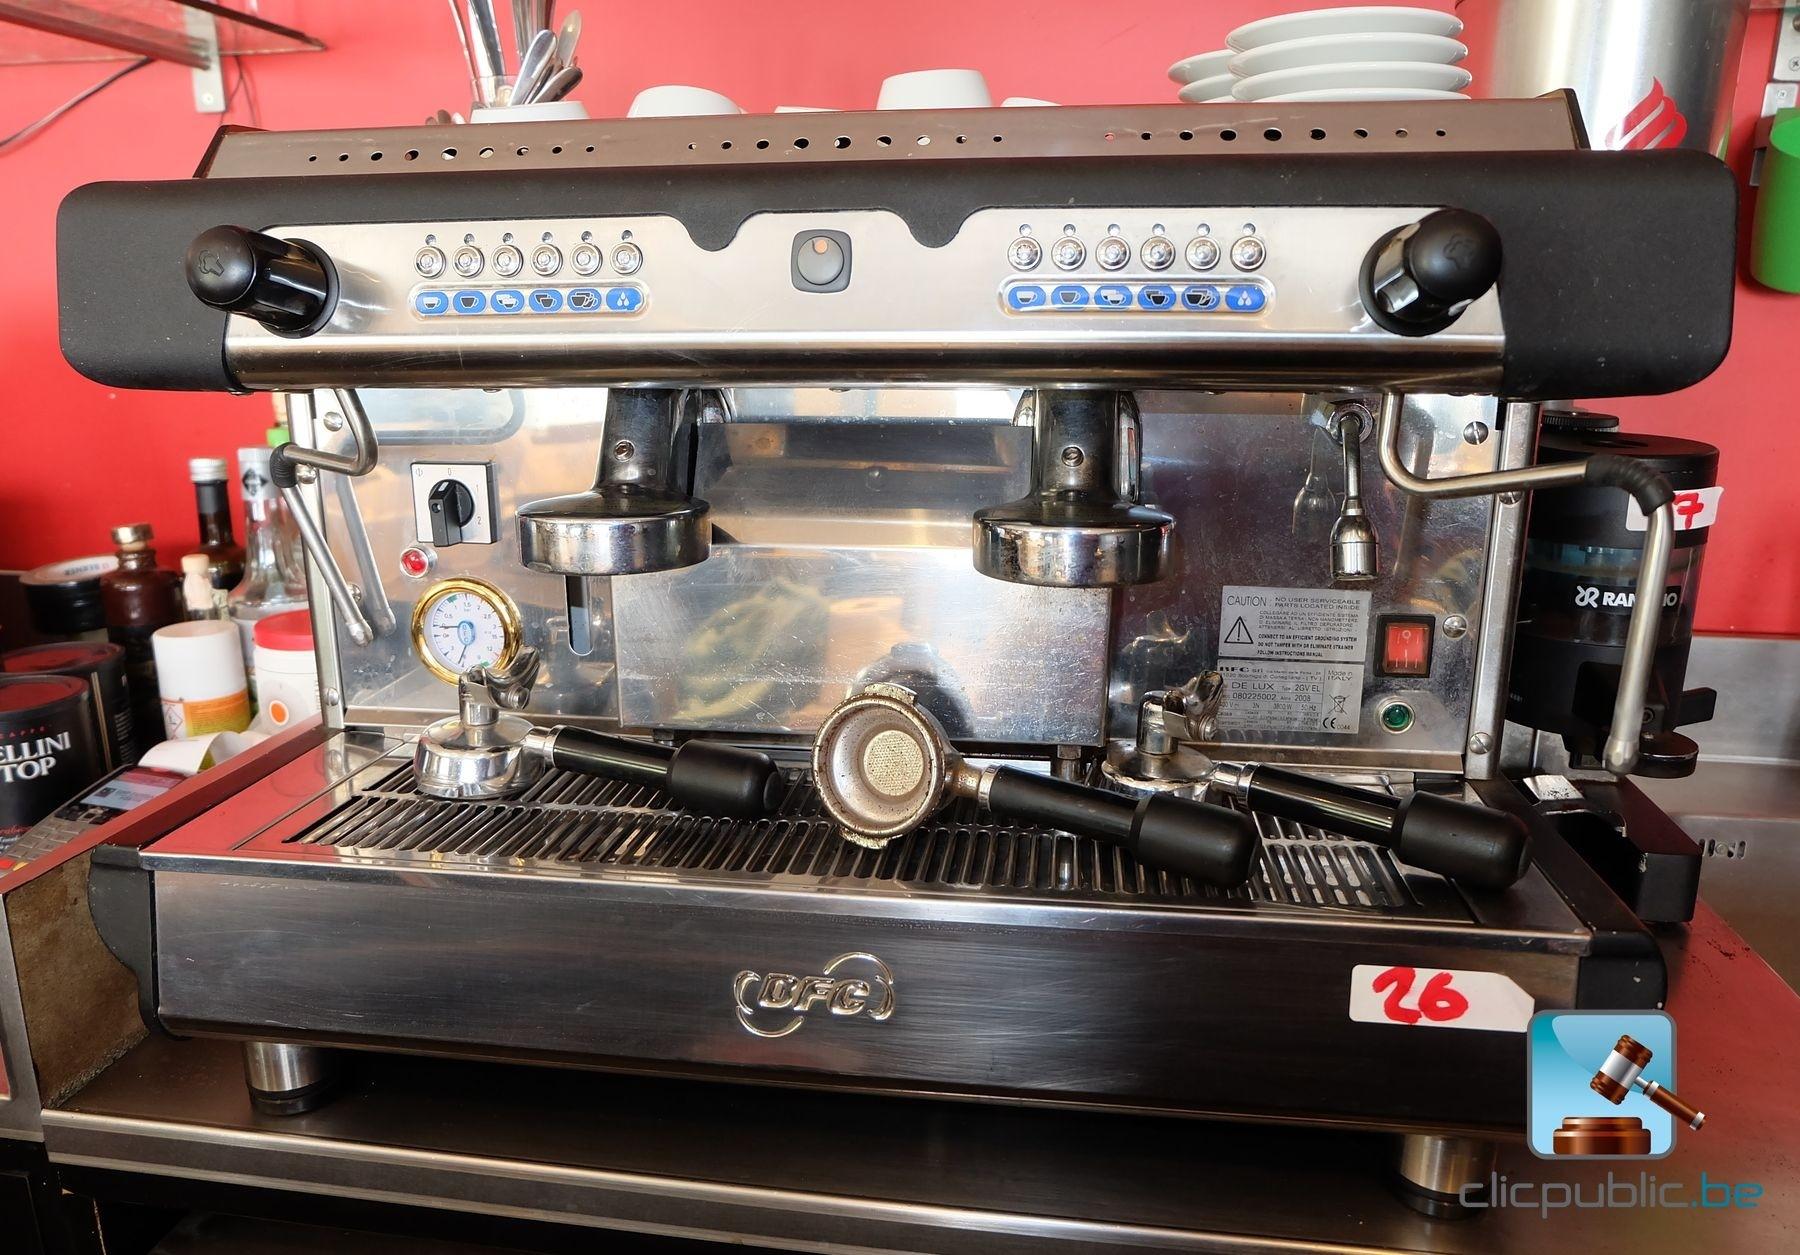 machine caf professionnelle bcf de lux 2gvel ref 26. Black Bedroom Furniture Sets. Home Design Ideas